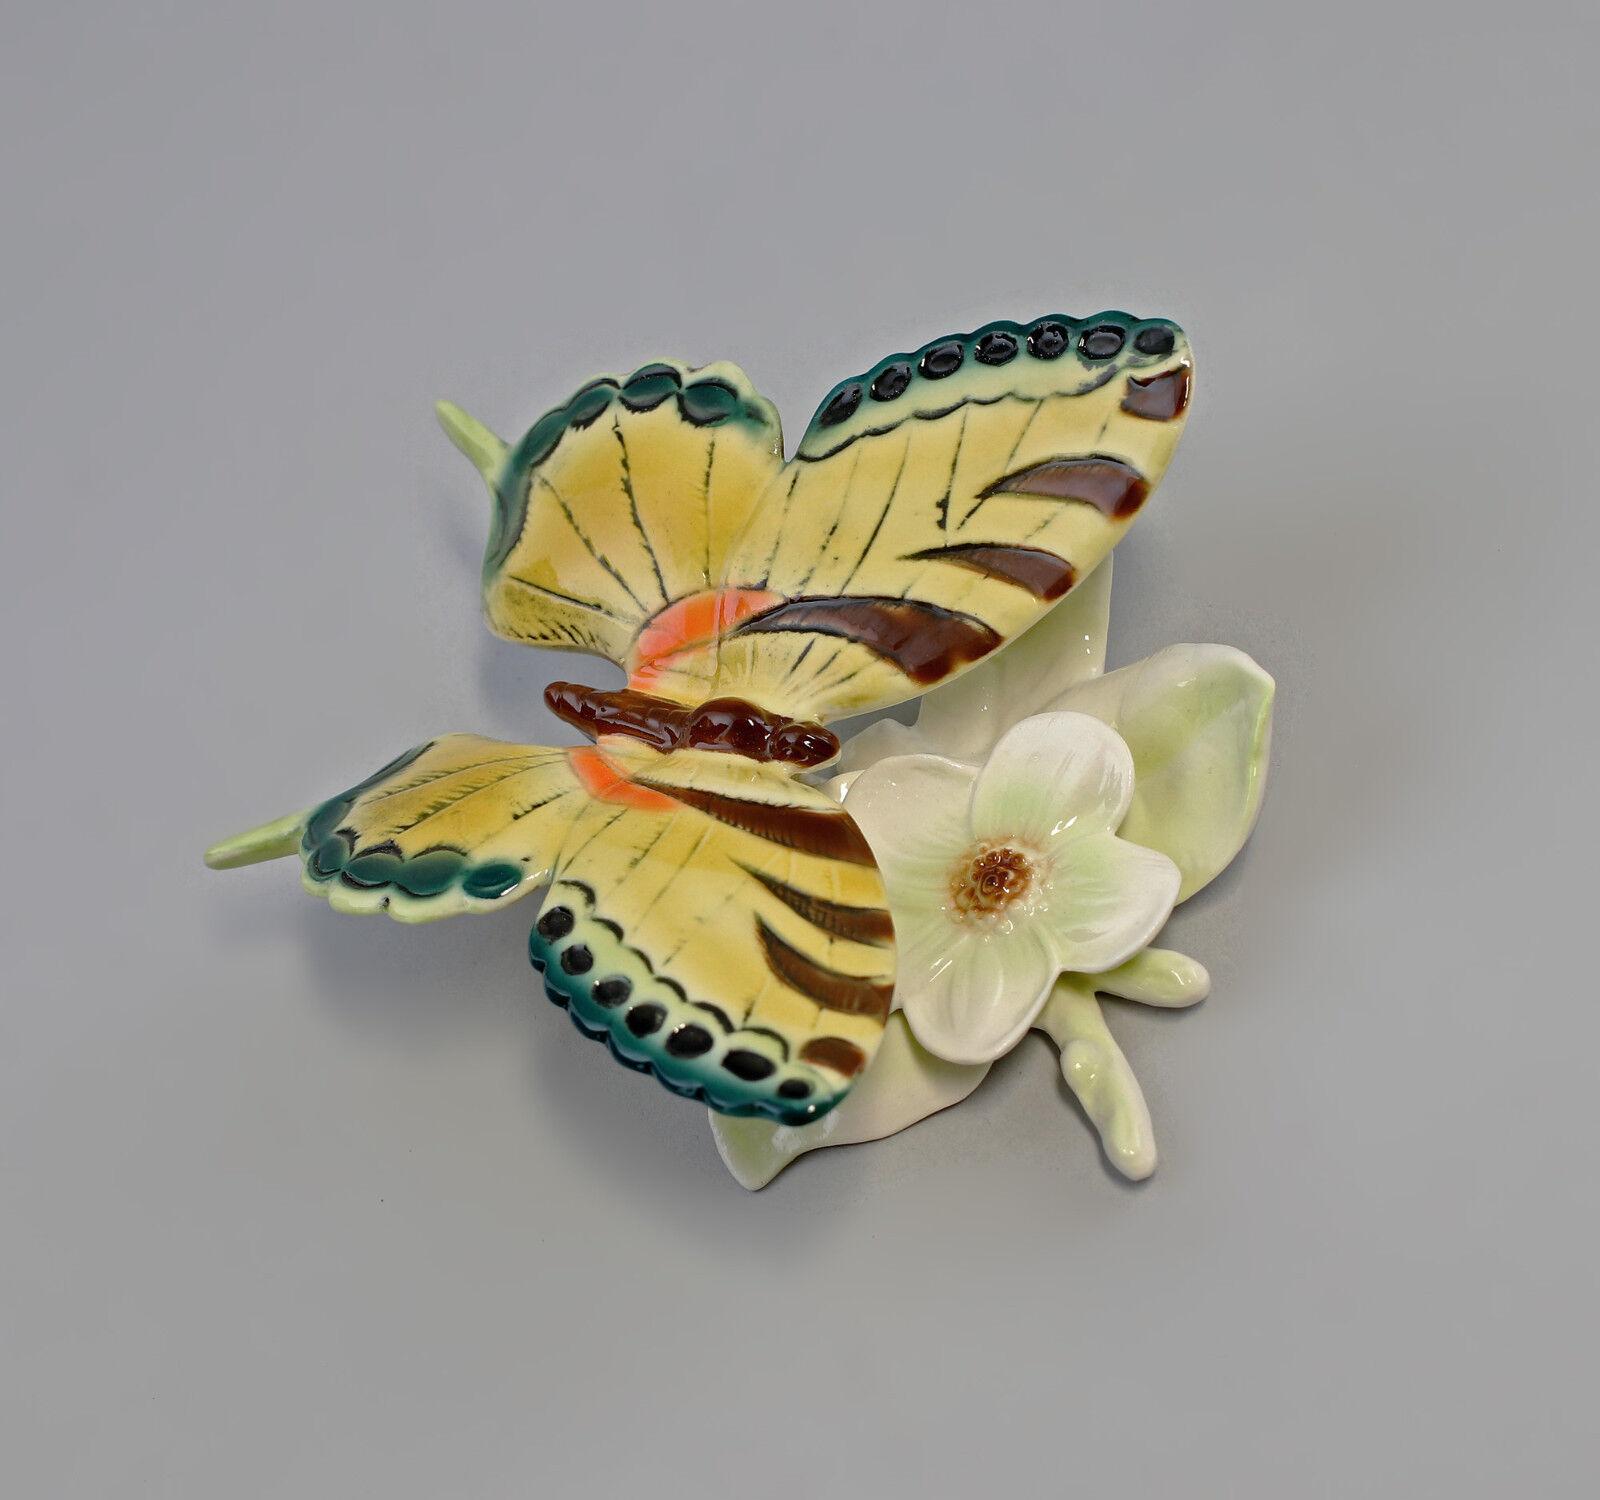 9941933 ens porcelana figura 10x11cm mariposa floración verde 10x11cm figura 7f806d